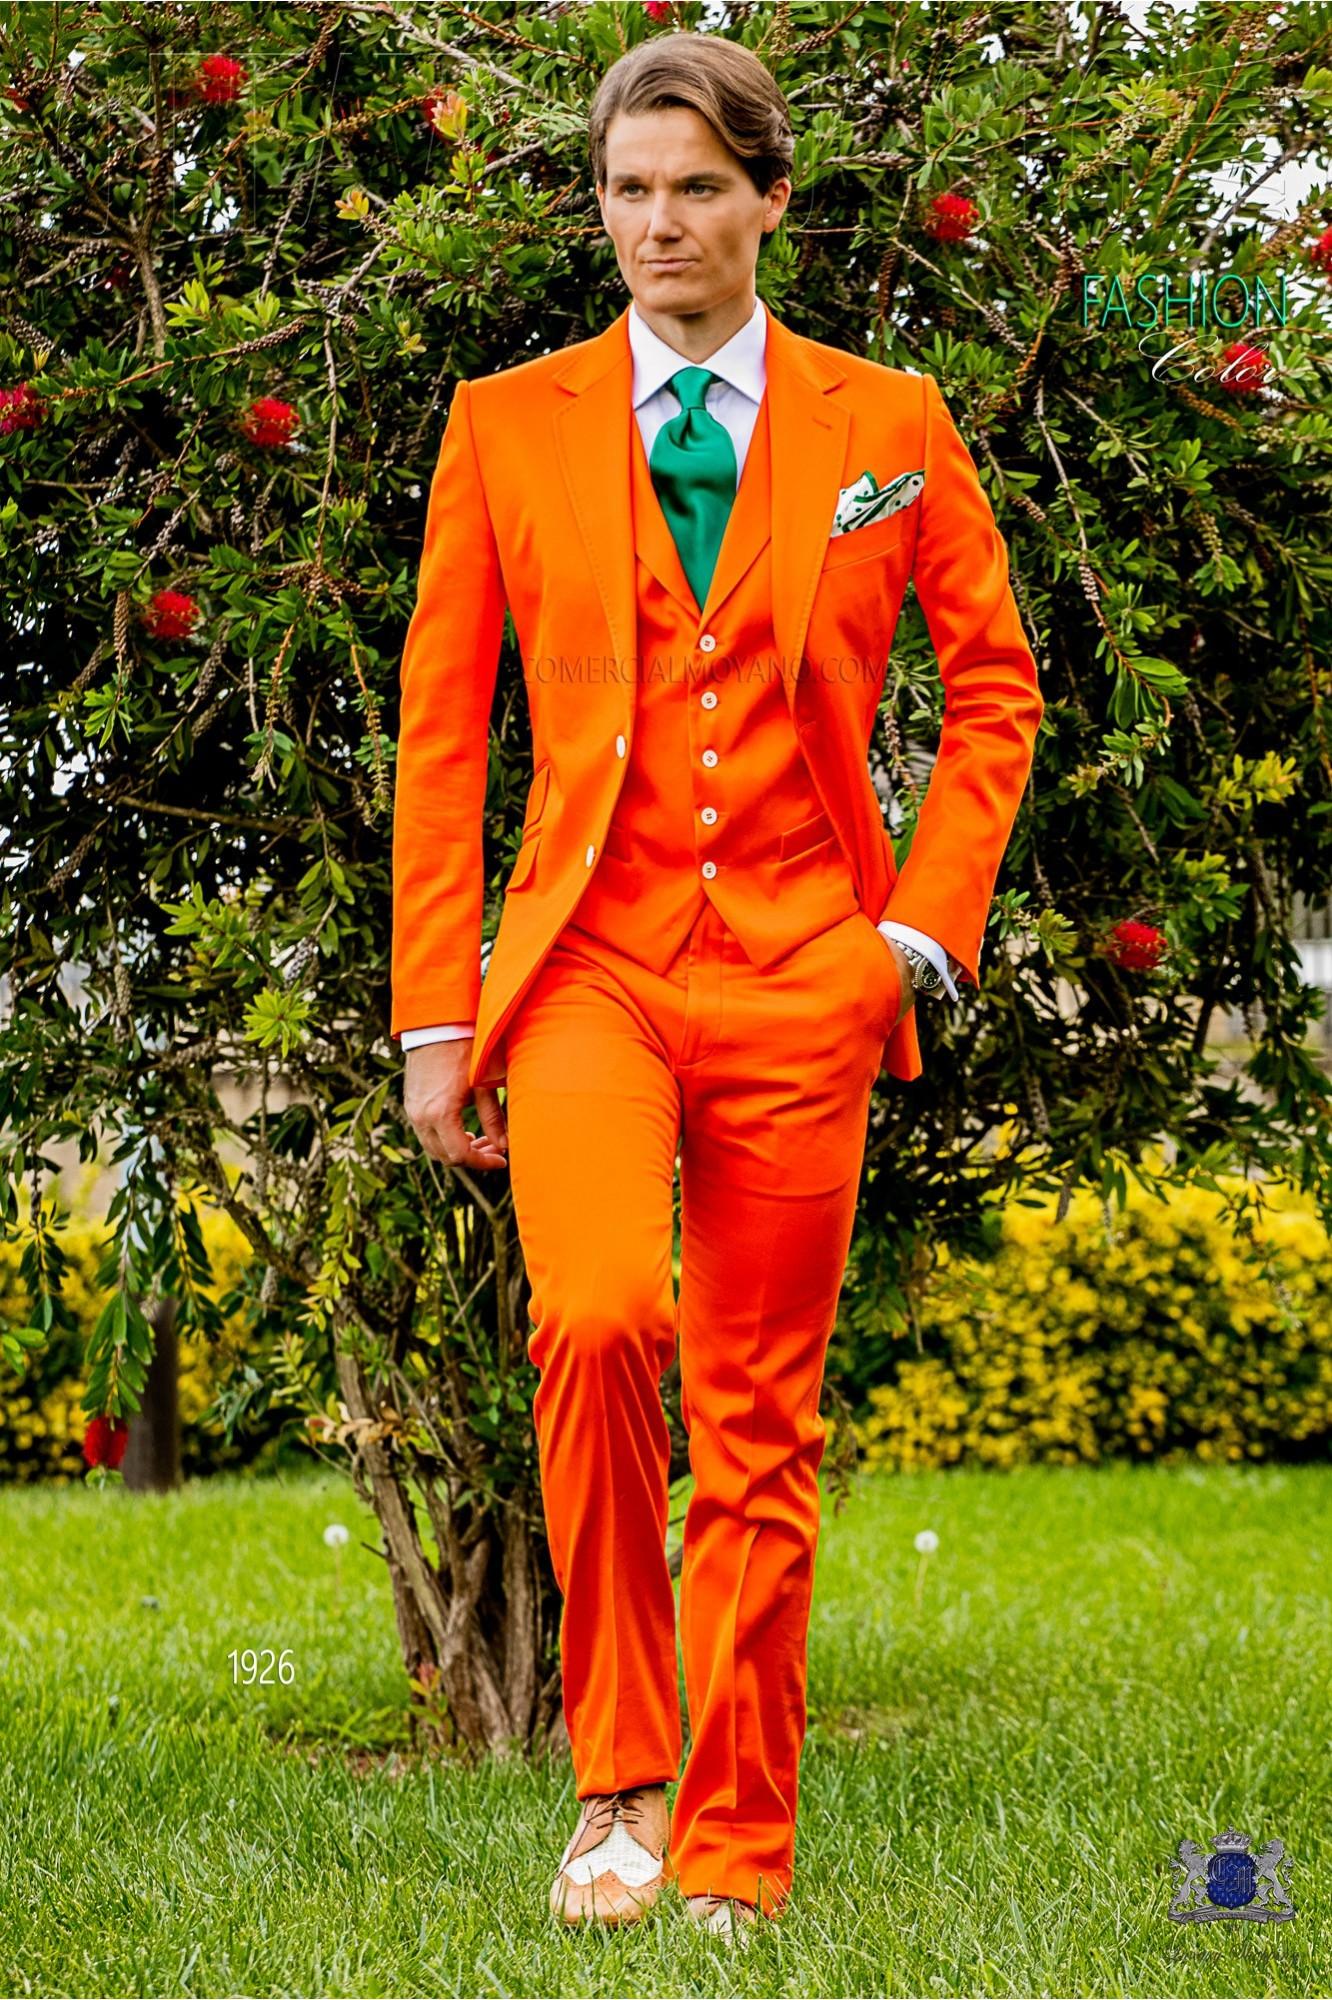 Traje italiano a medida naranja en raso de algodón